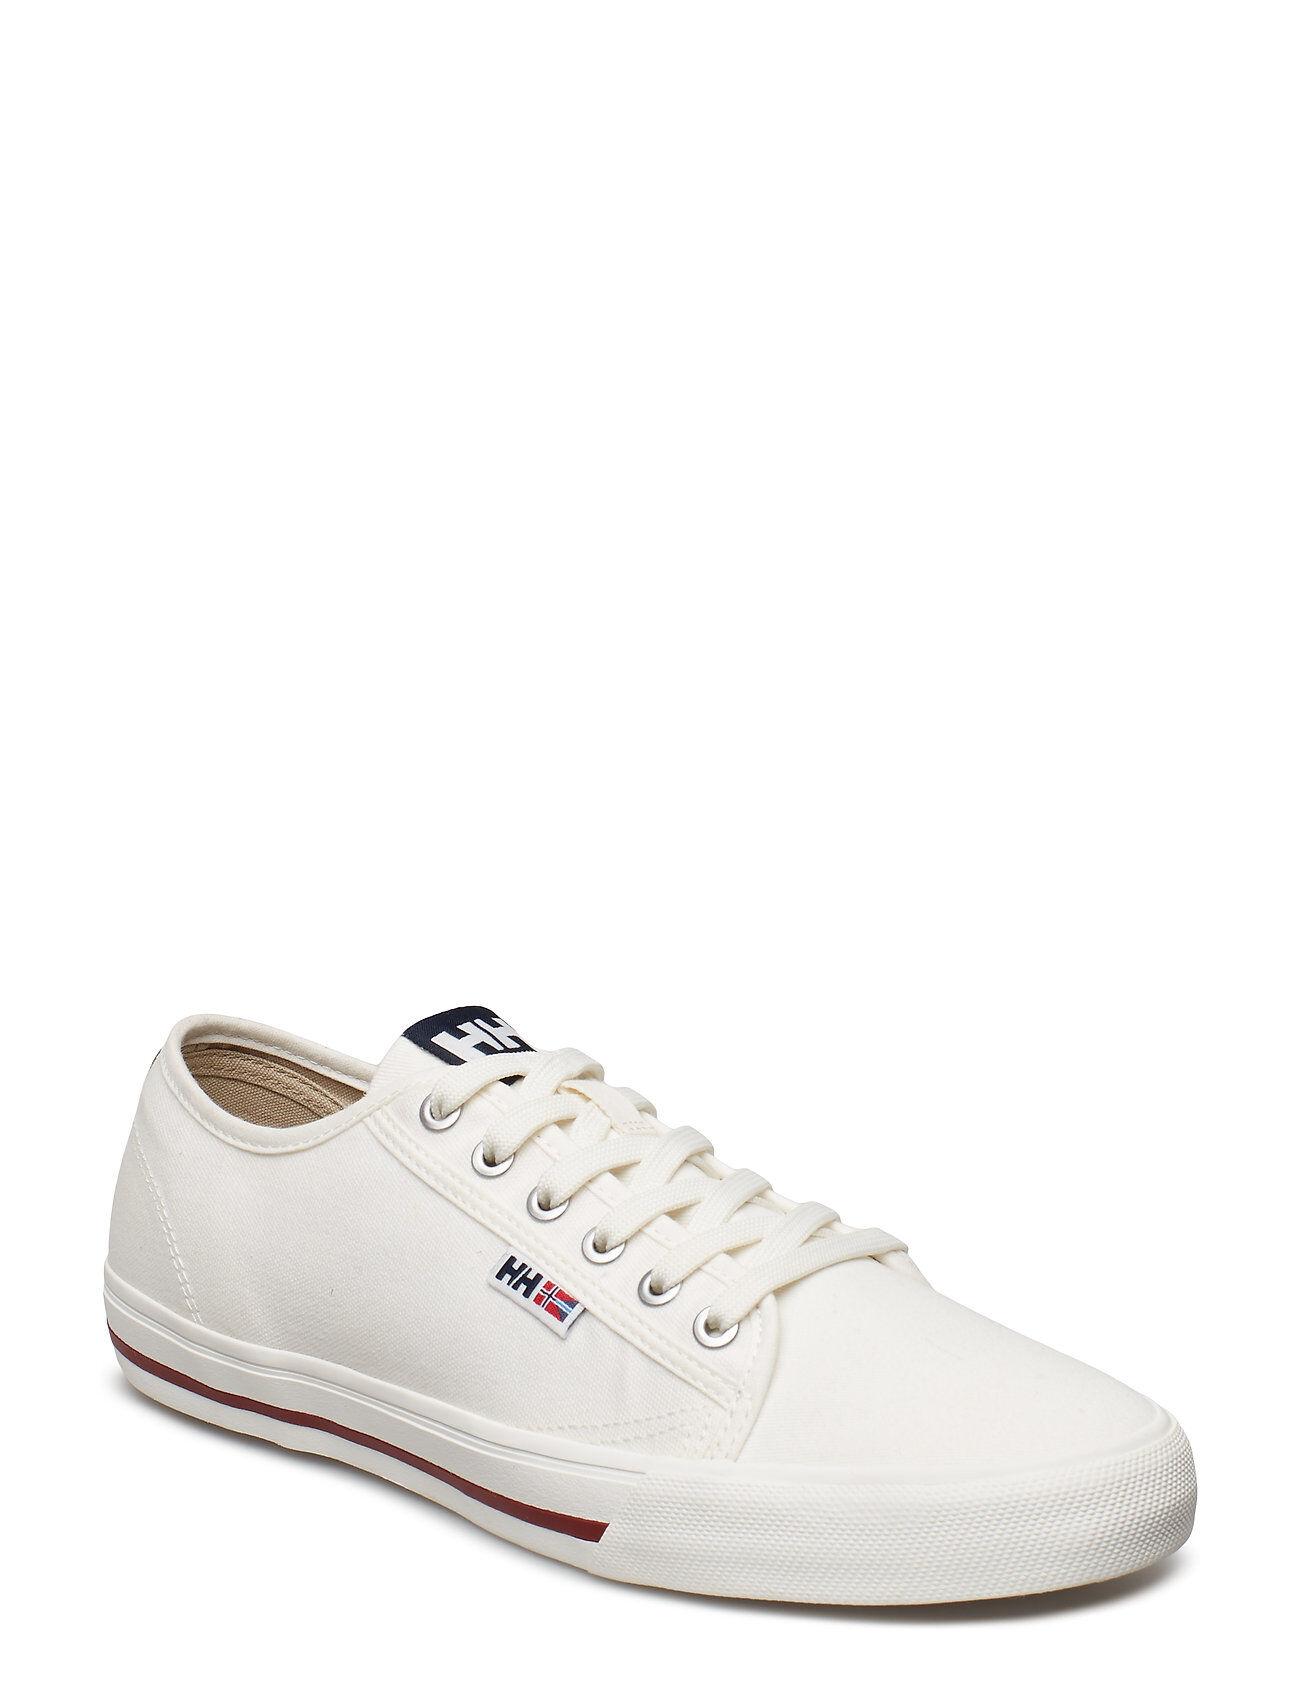 Image of Helly Hansen Fjord Canvas Shoe V2 Matalavartiset Sneakerit Tennarit Valkoinen Helly Hansen